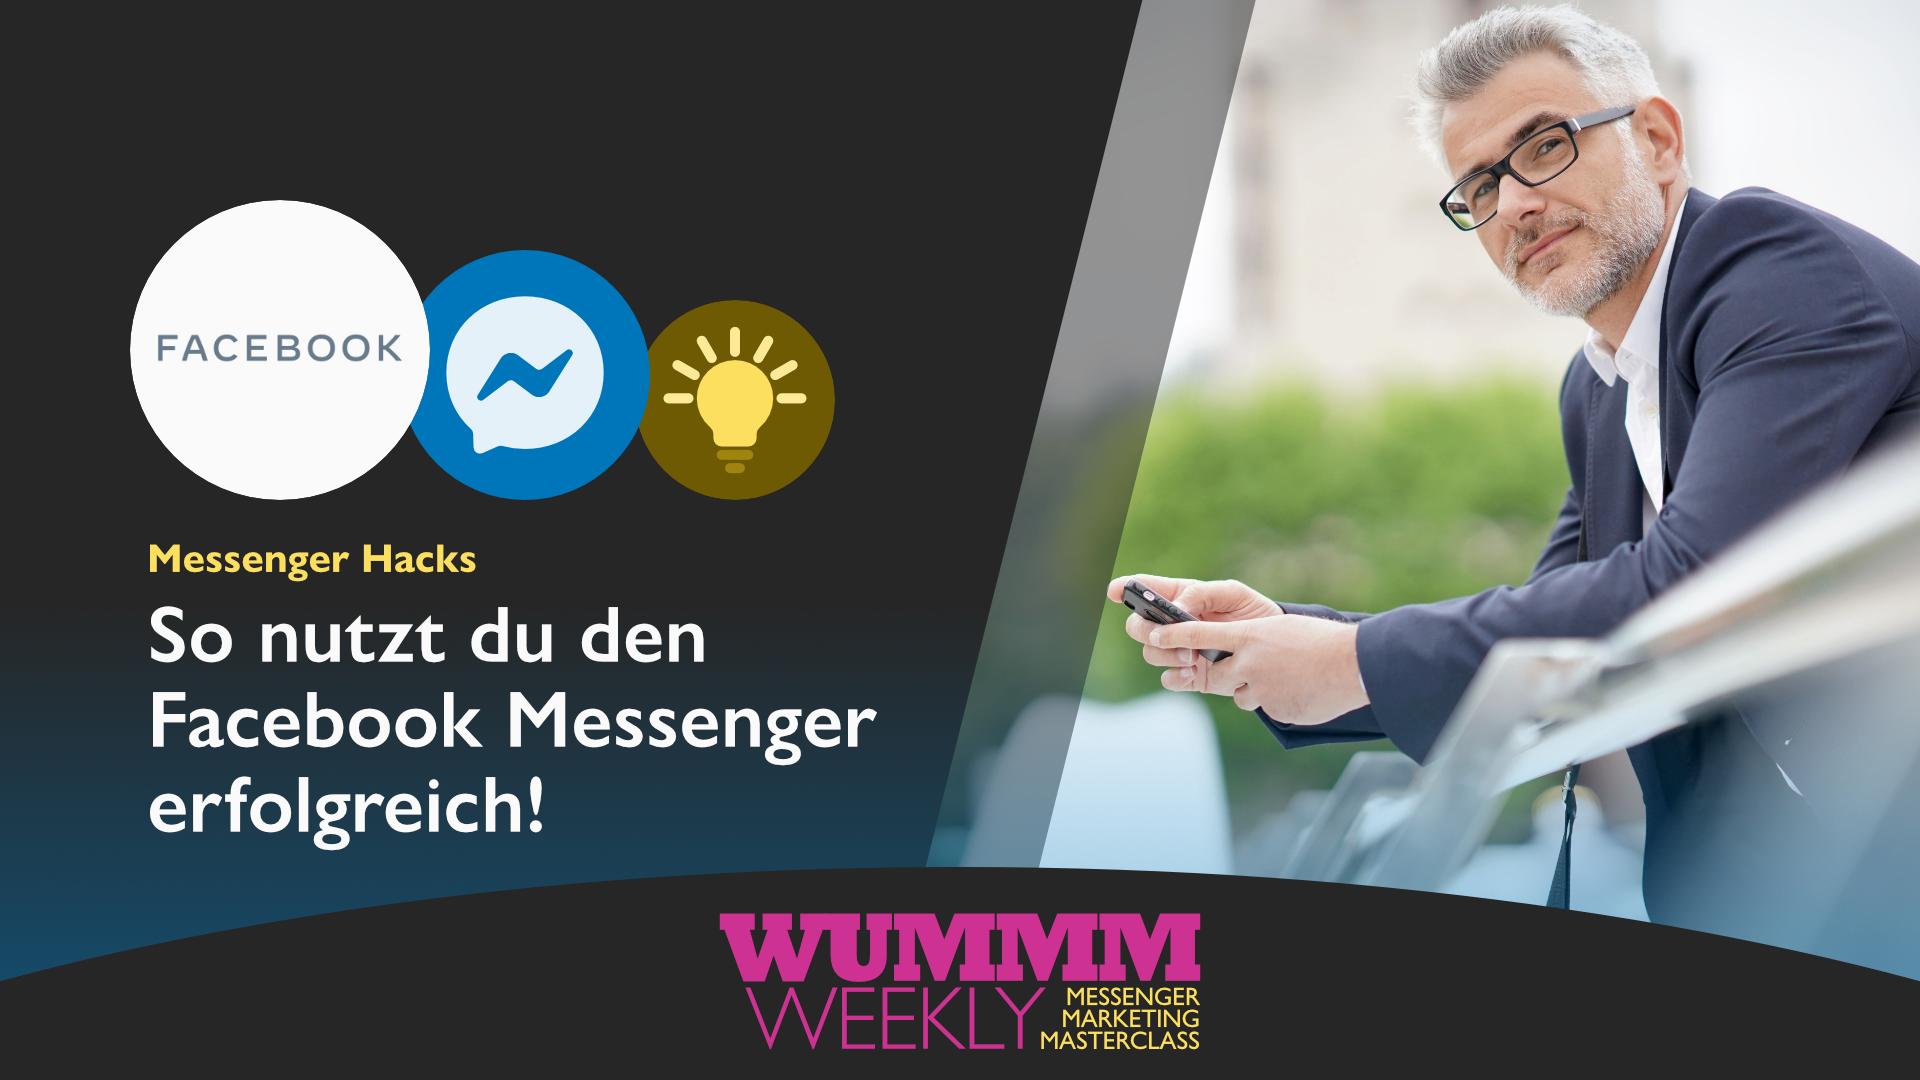 Wummm-weekly, Logo Facebook Messenger, Messenger Hacks, So nutzt du Facebook Messenger erfolgreich